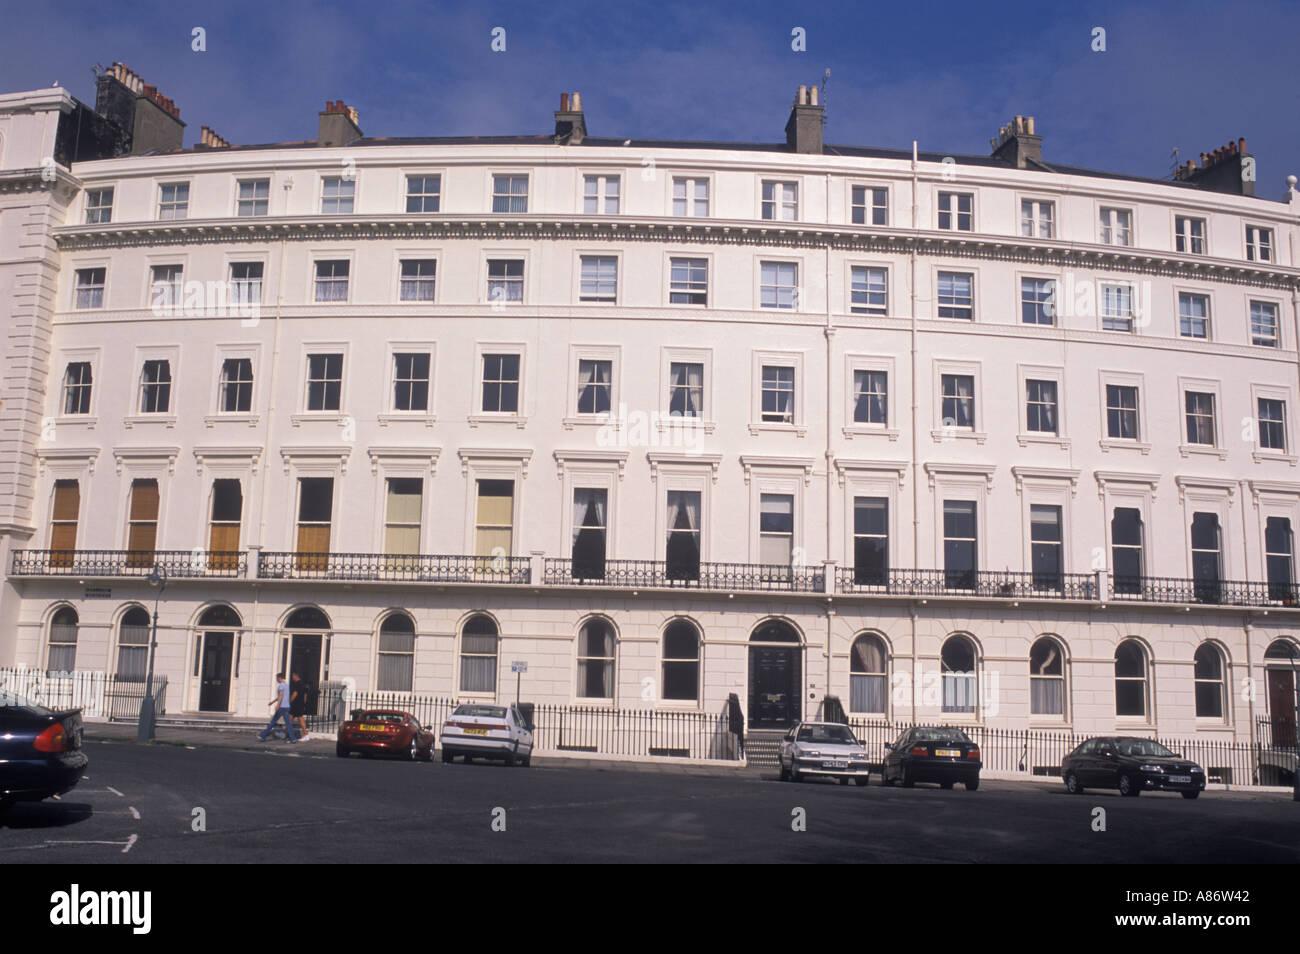 Hove, cerca de Brighton Seafront Palmeria plaza del siglo XIX, famosa por su arquitectura Regency Sussex Reino Unido HOMER SYKES Imagen De Stock